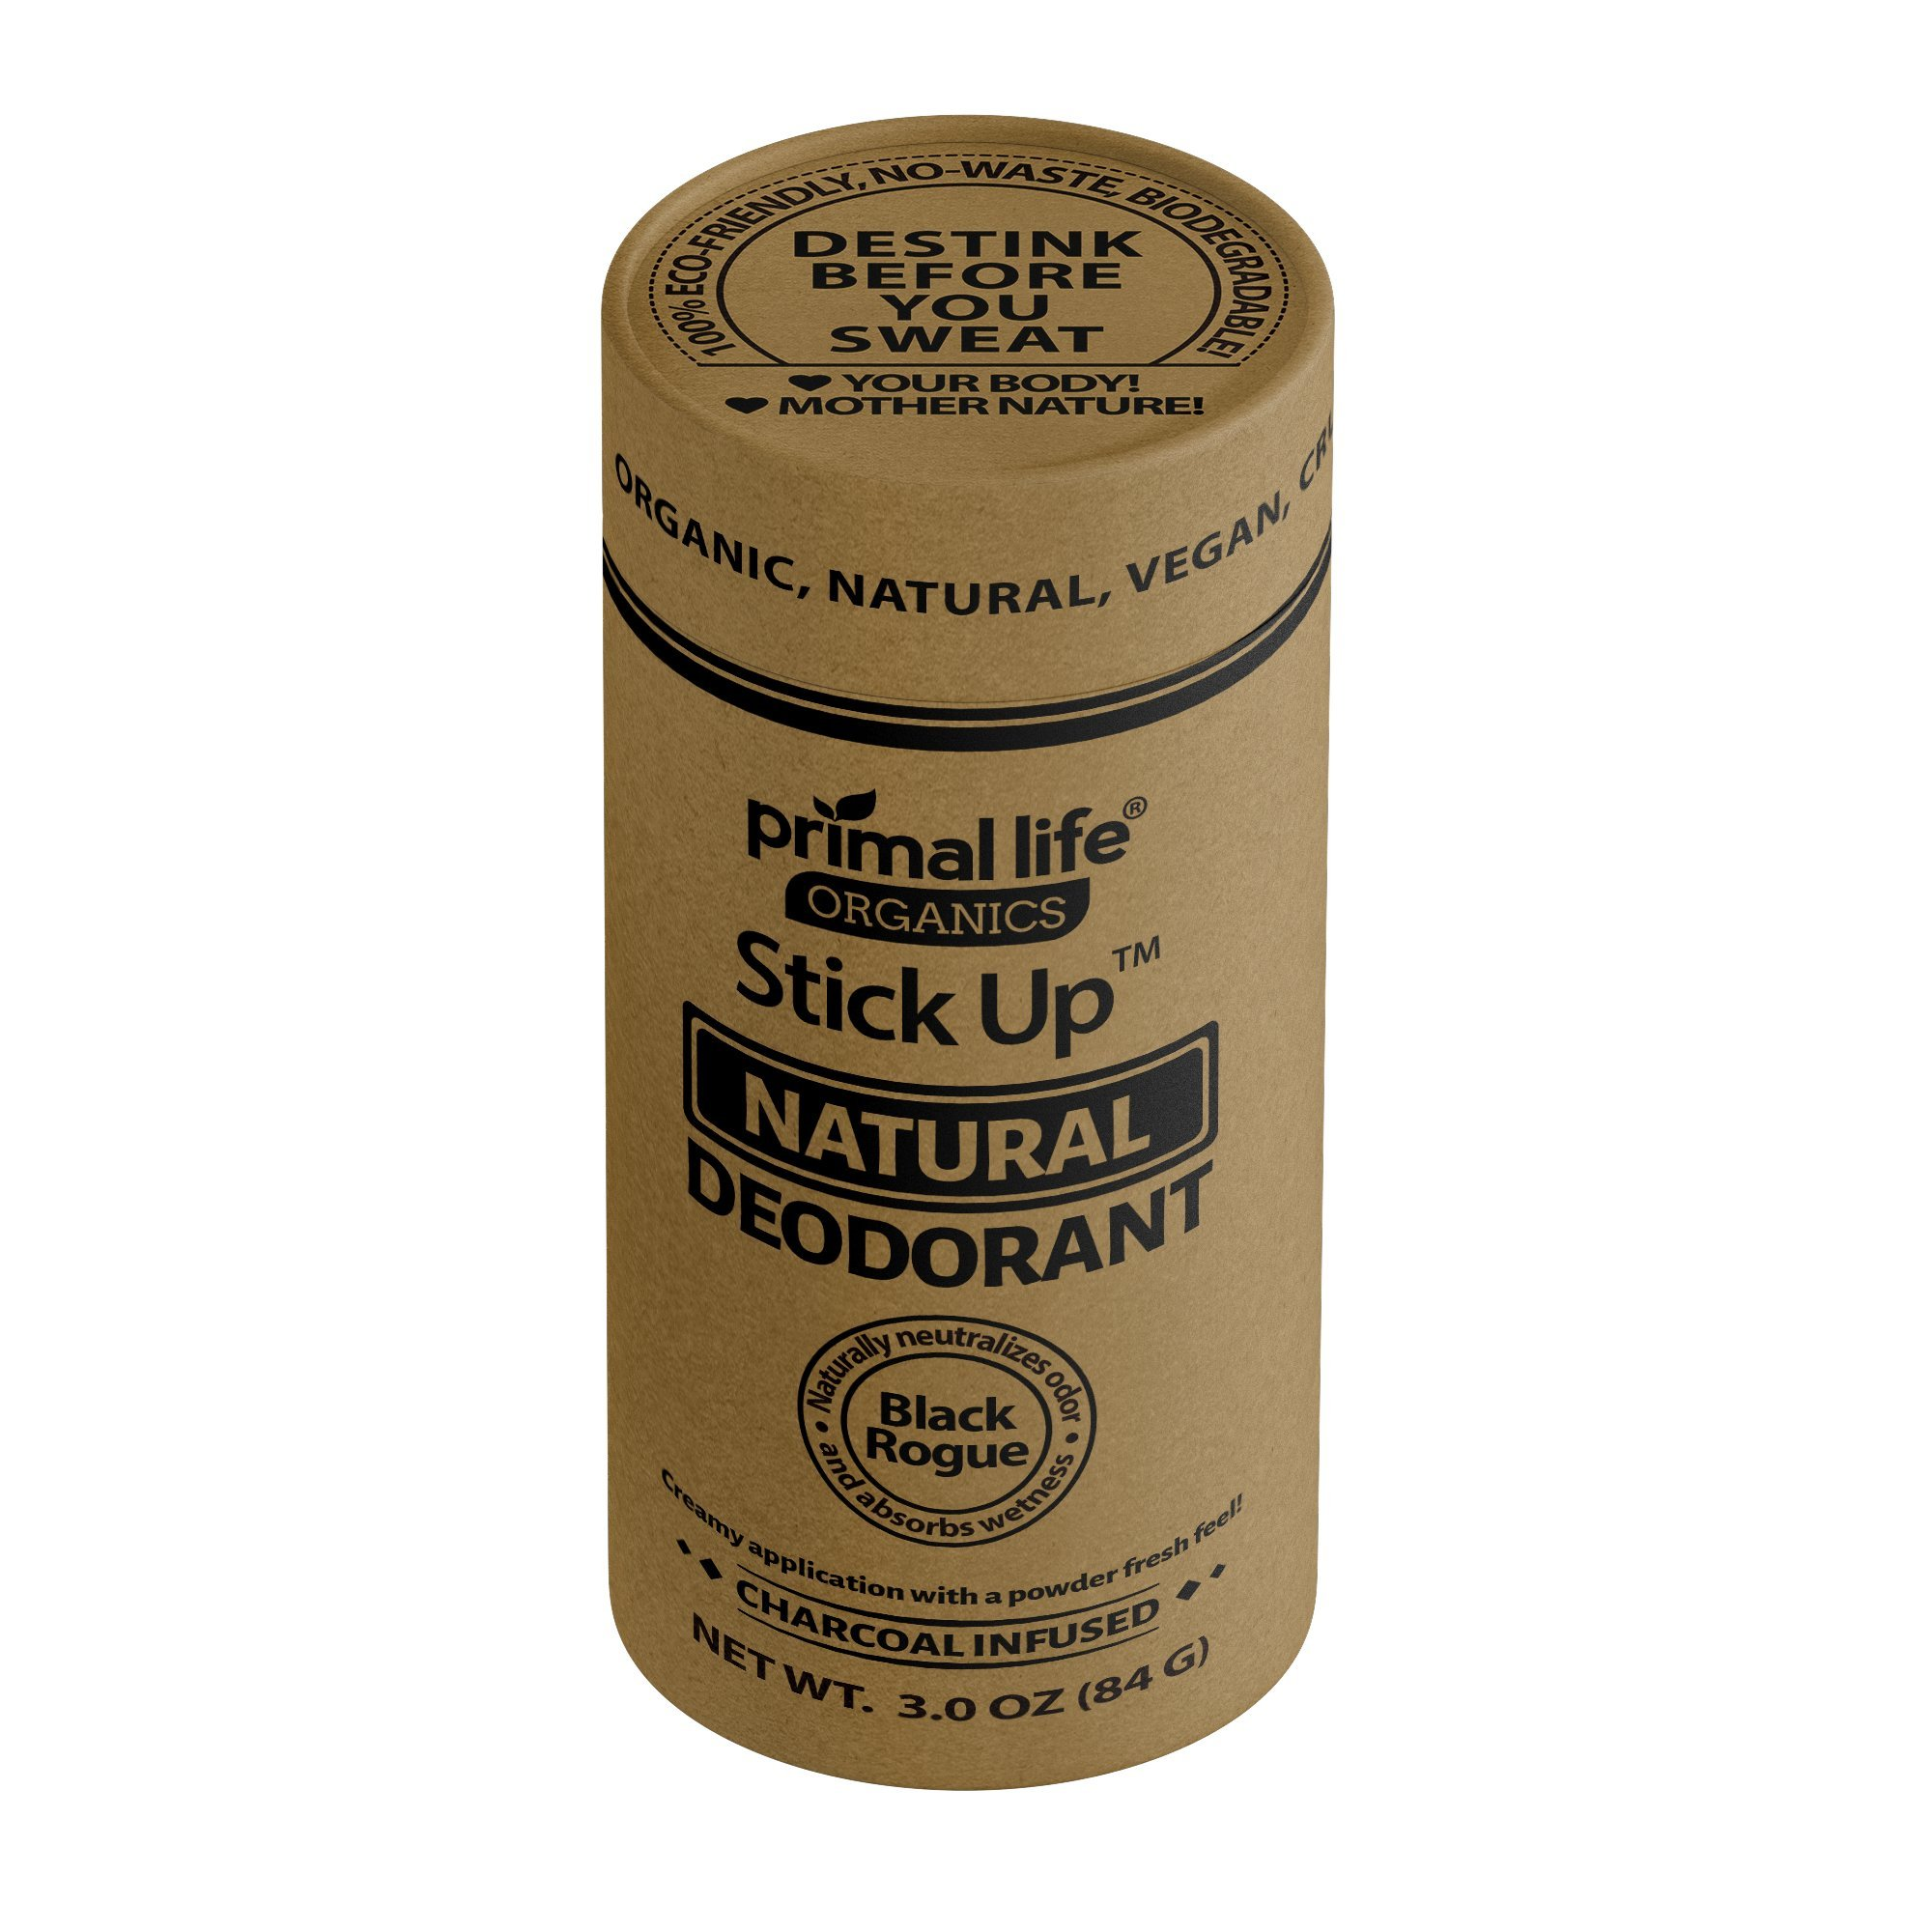 Deodorant Organic Natural Formula Elimination